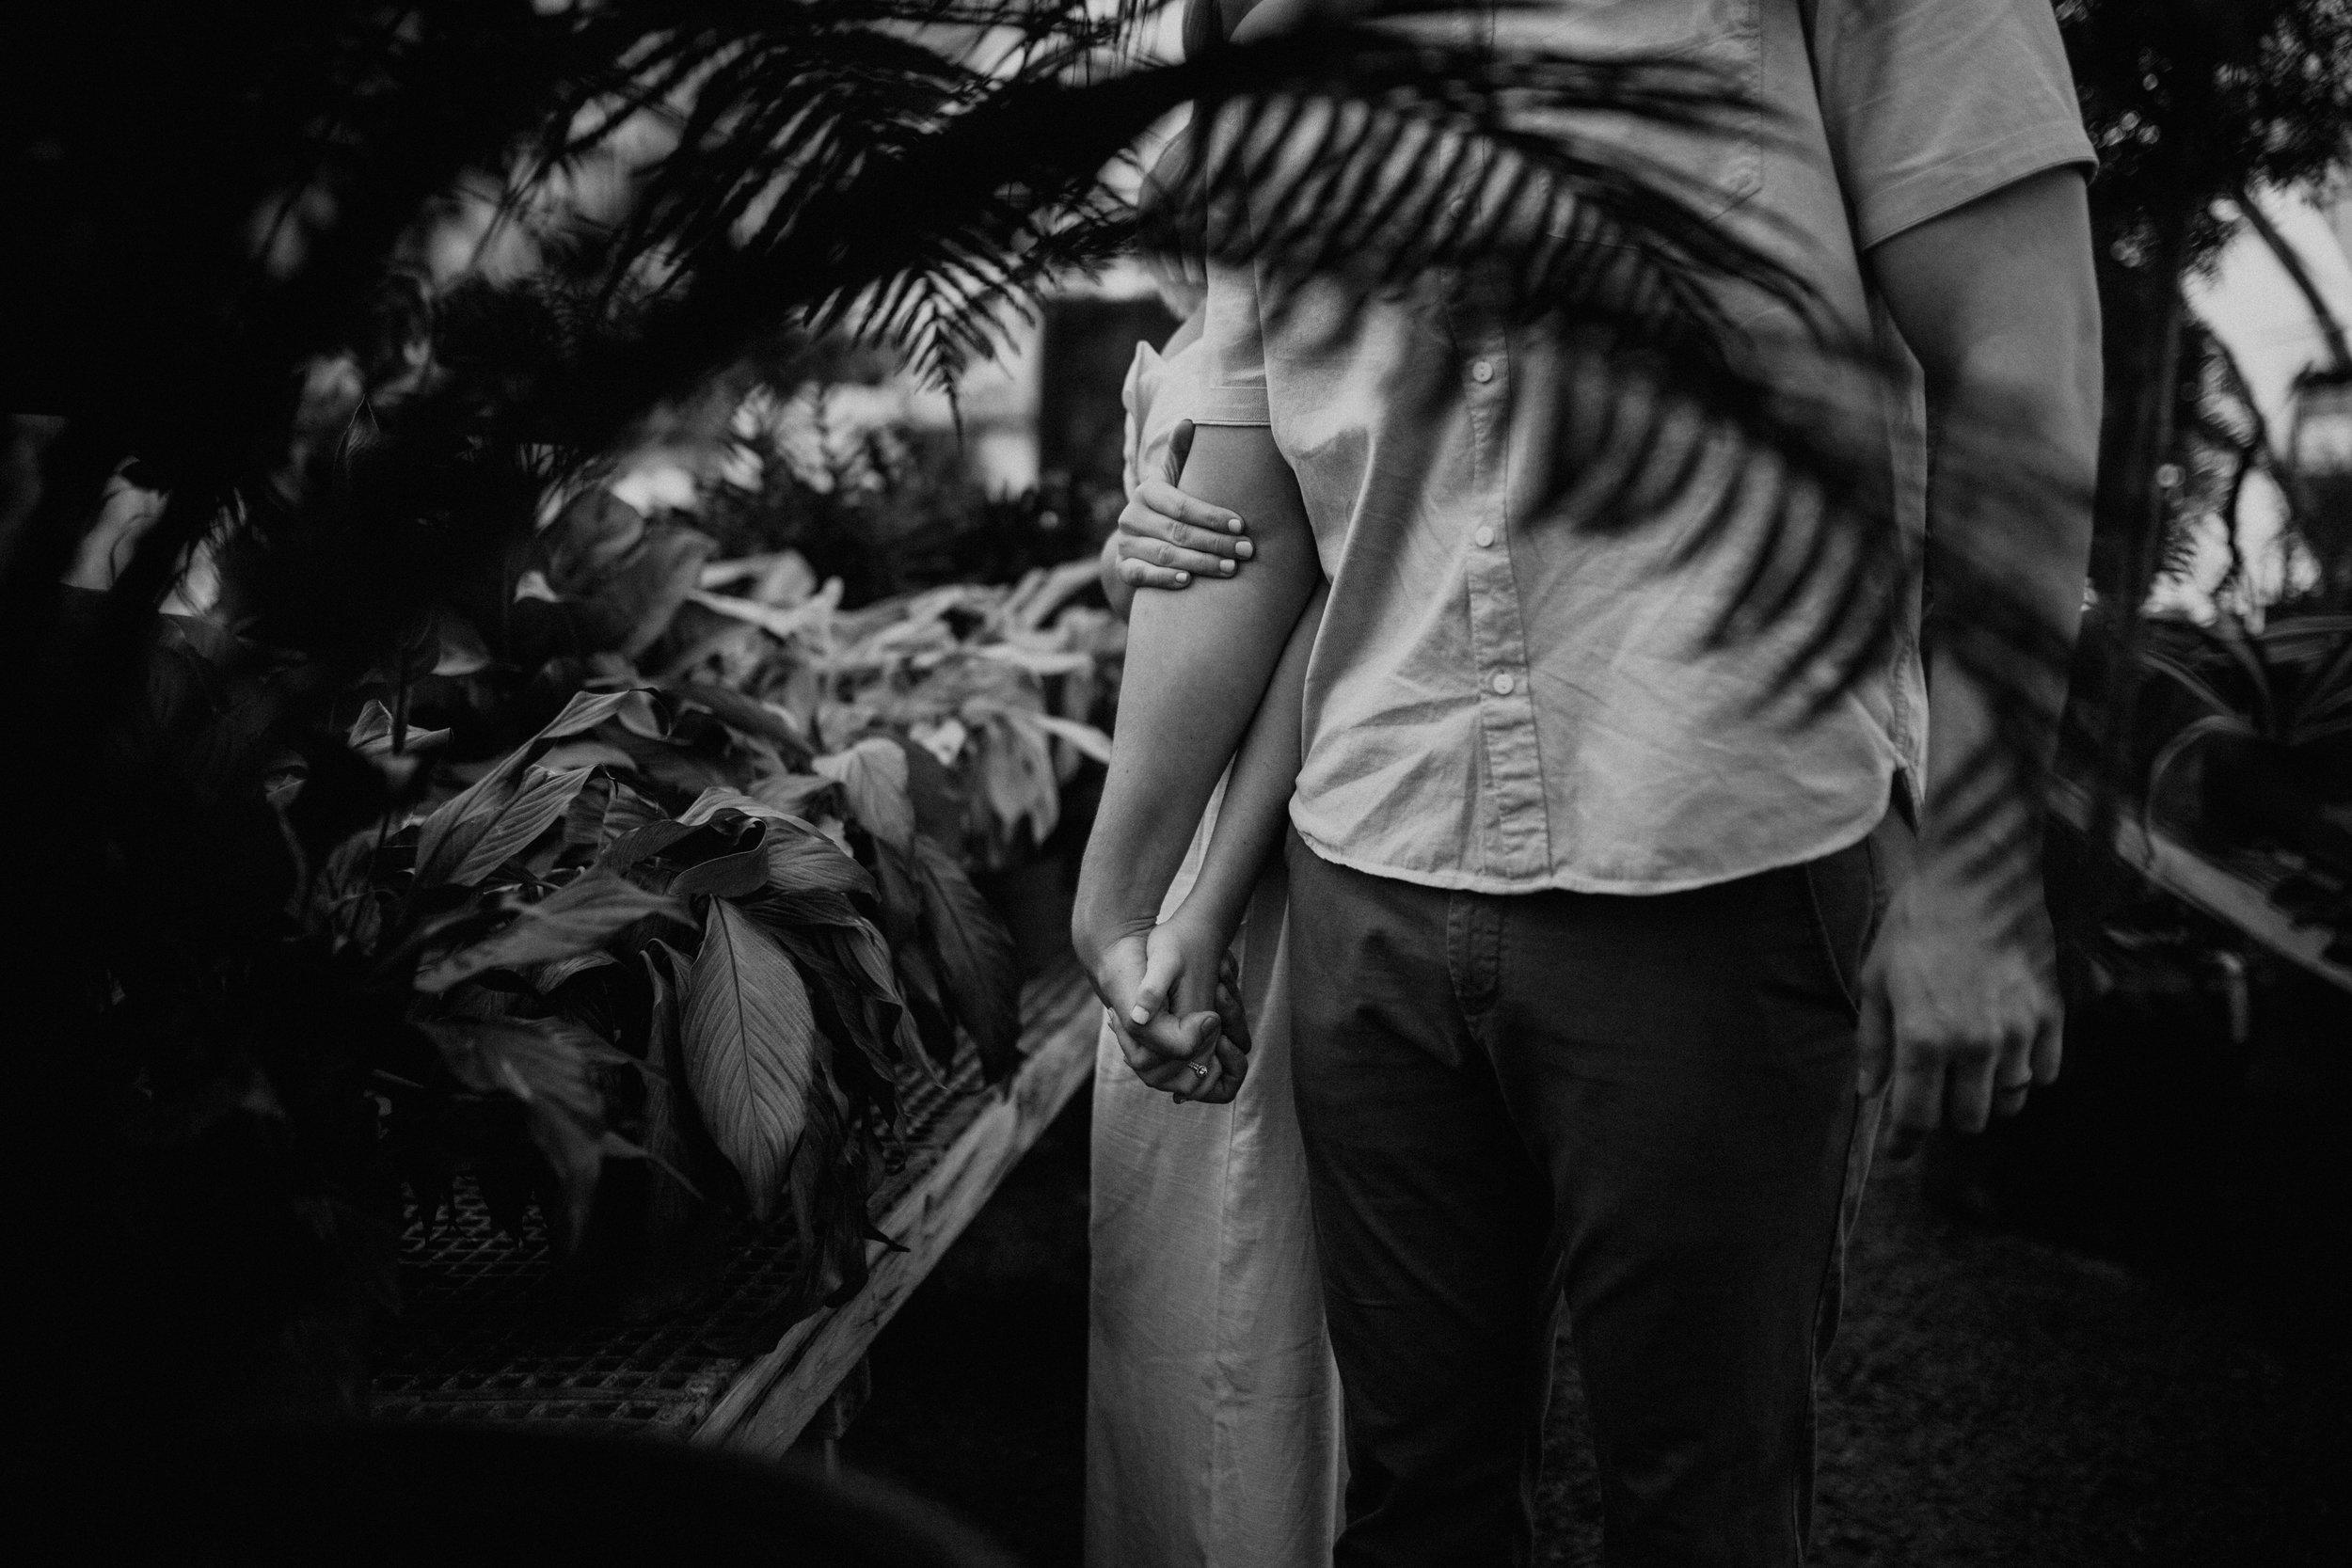 nashville_tn_wedding_photographer_collab_wright_photographs_0033.JPG